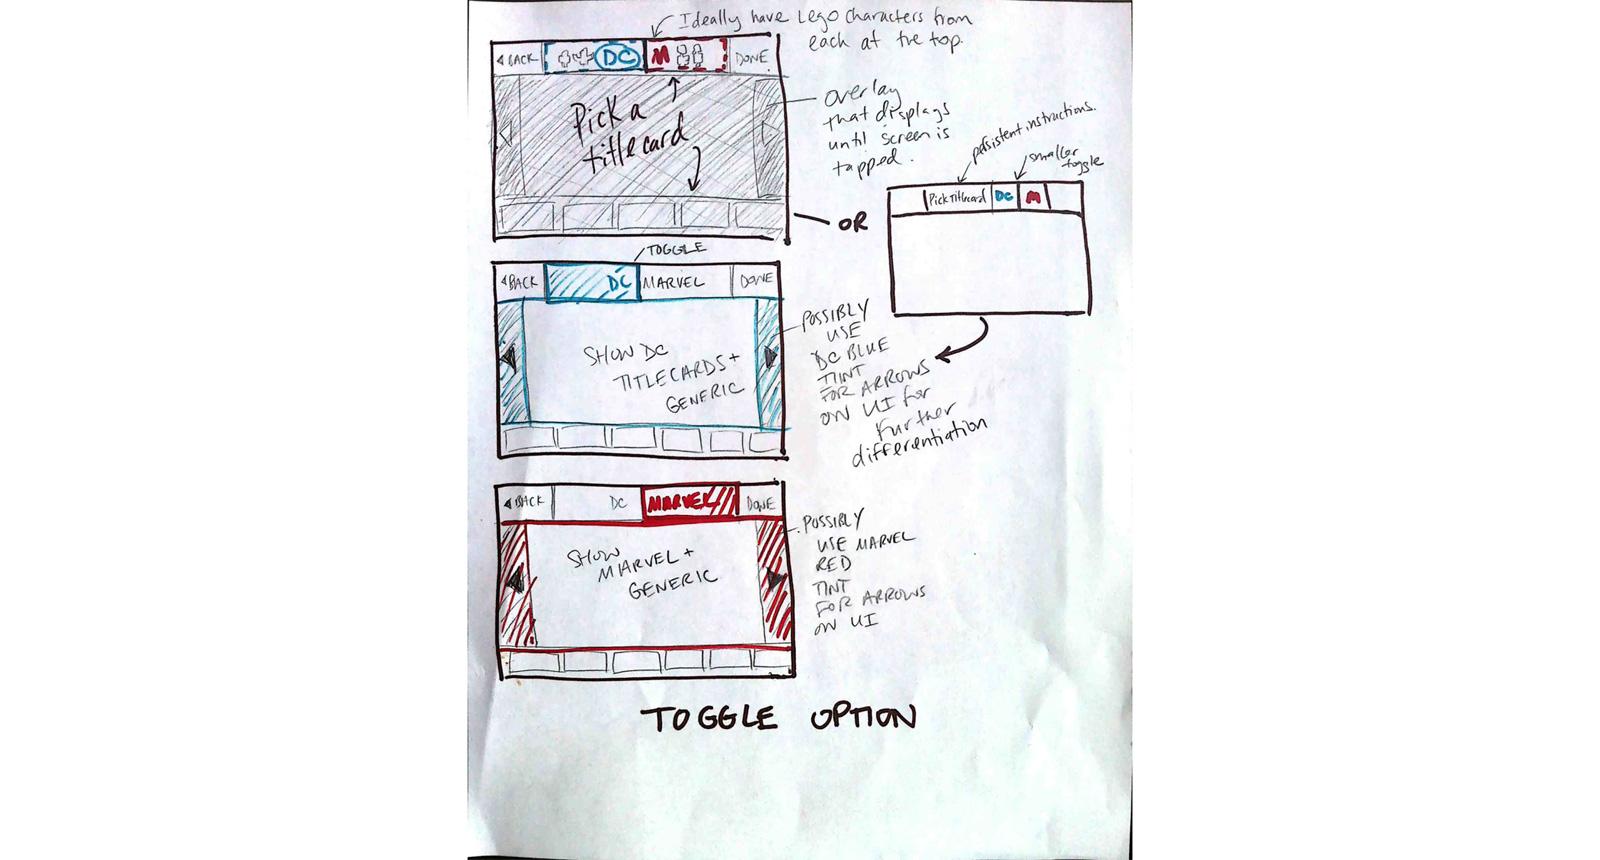 lego-brand-separate1c.jpg